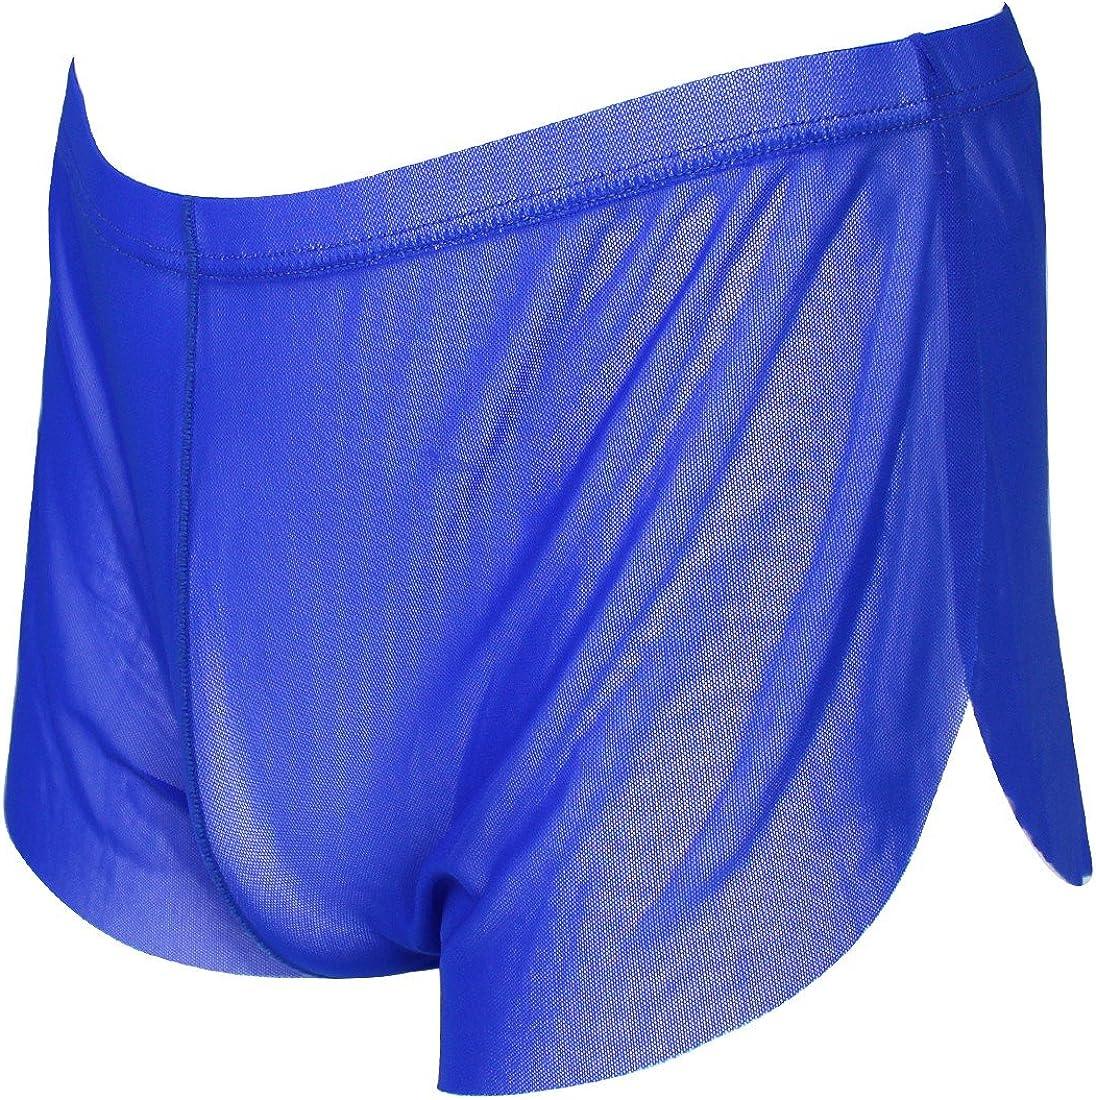 MSemis Men's Underwear Mesh Boxer Briefs Shorts Sheer Split Side Swim Trunks Swimwear